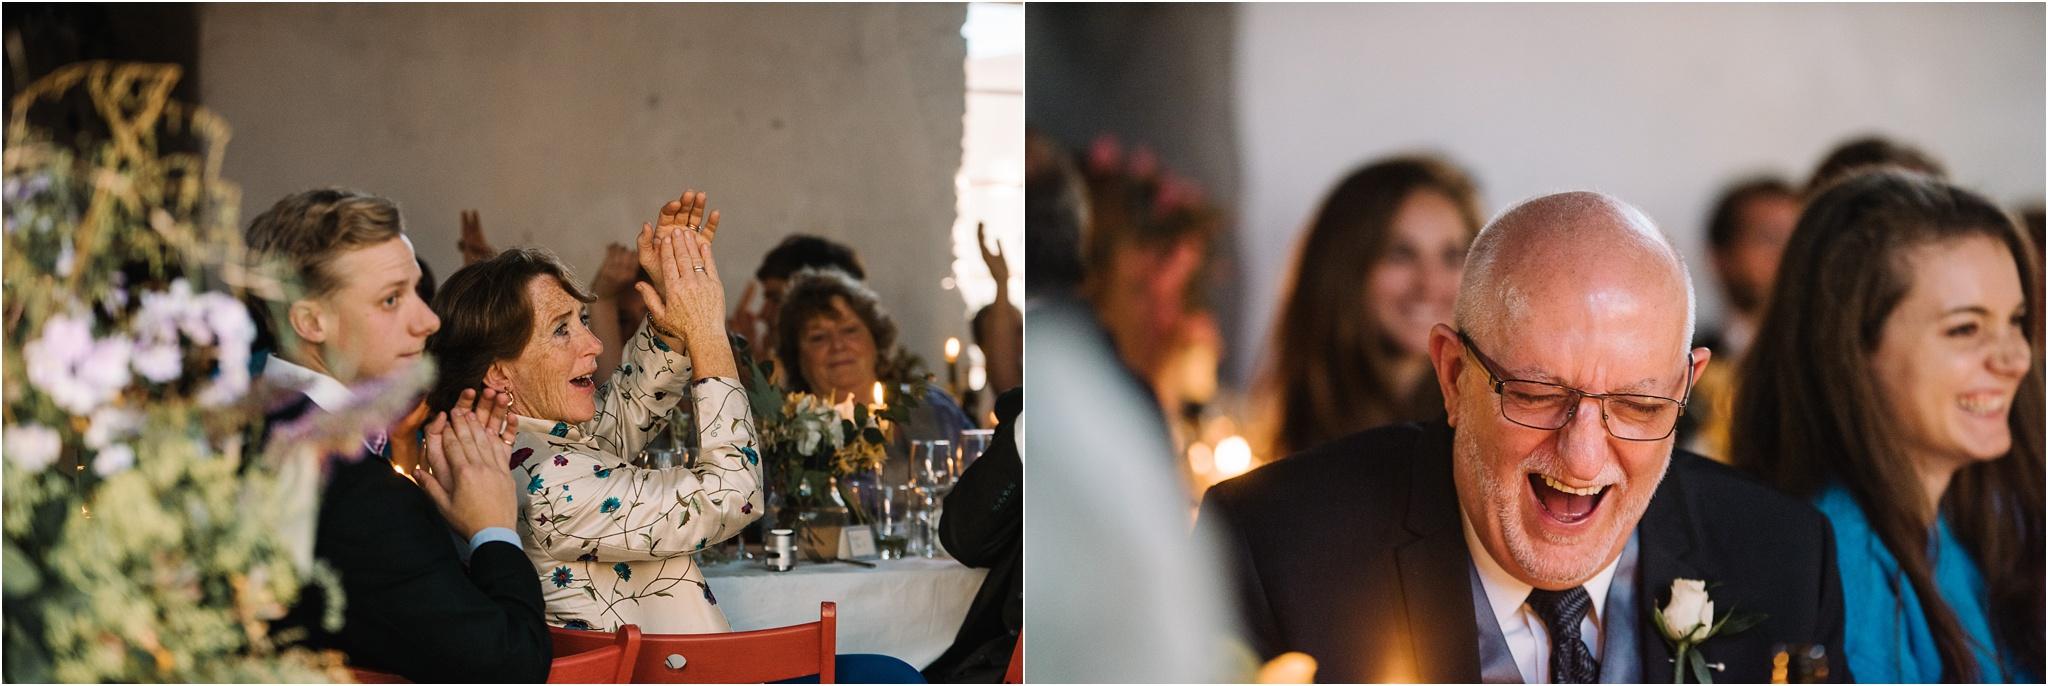 Outdoor-country-wedding-Edinburgh-photographer__0081.jpg